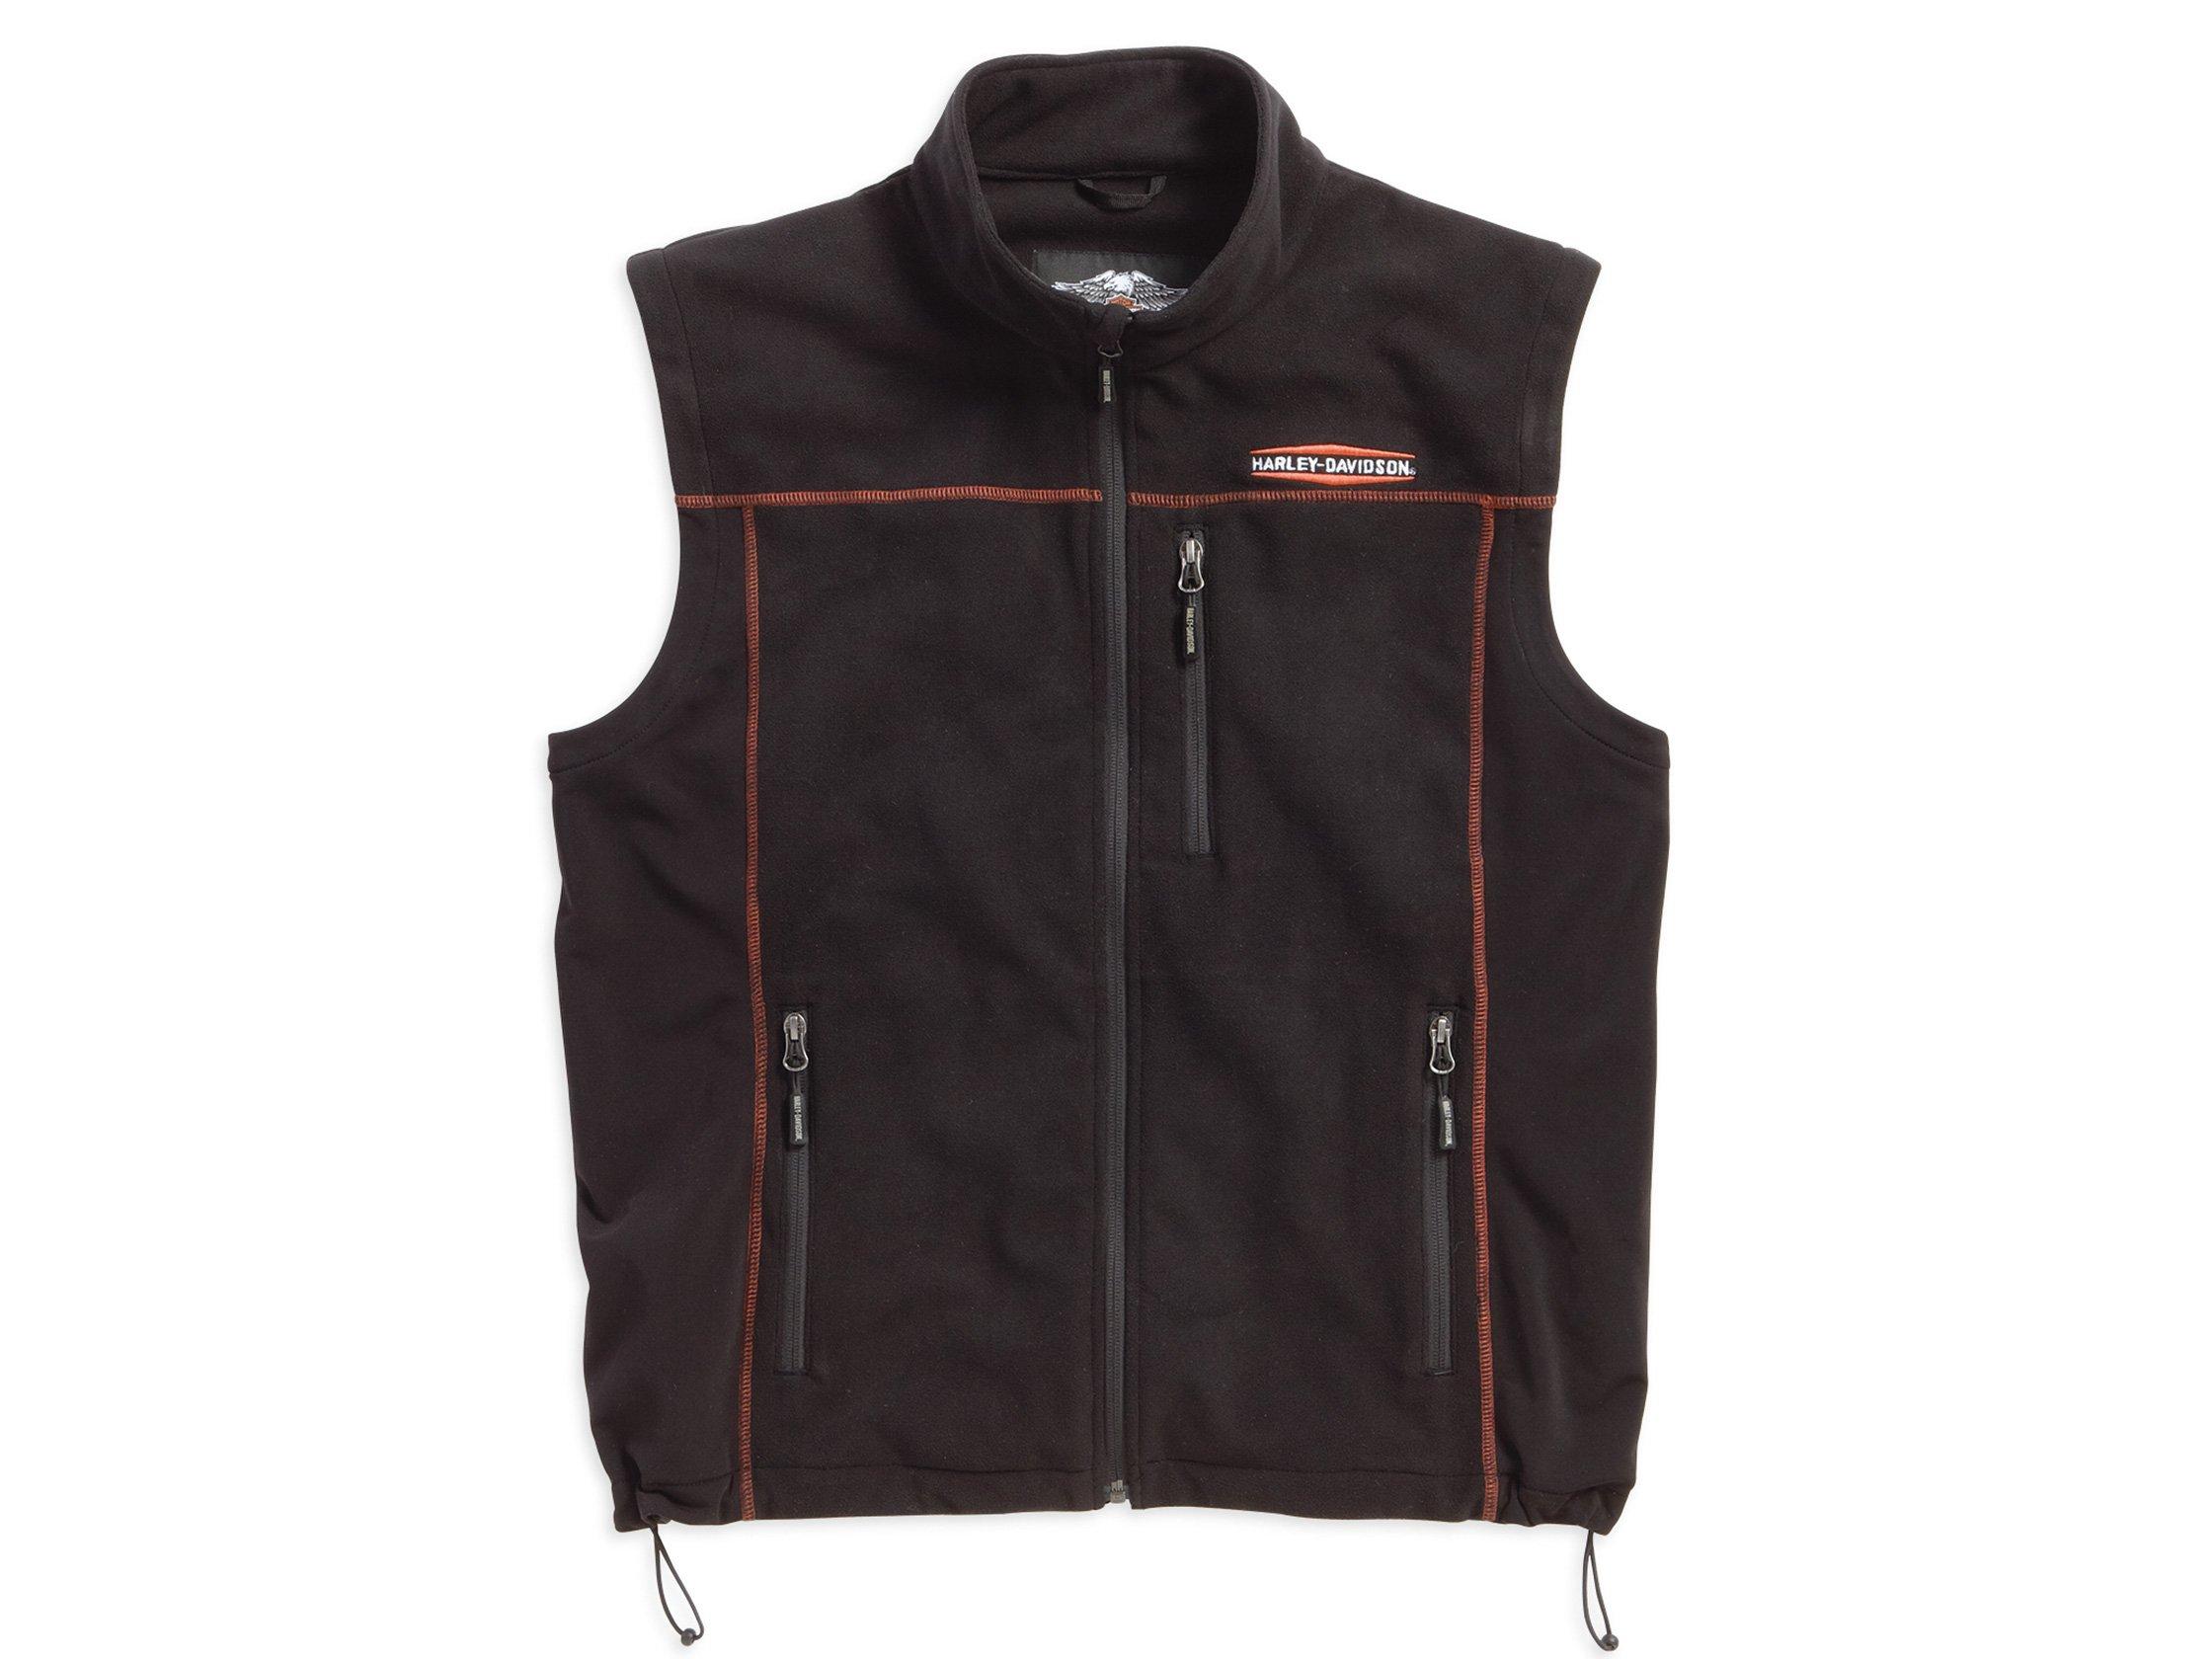 Harley-Davidson Men's Fleece Mid-Layer Vest Windproof, Black. 98567-16VM (S)